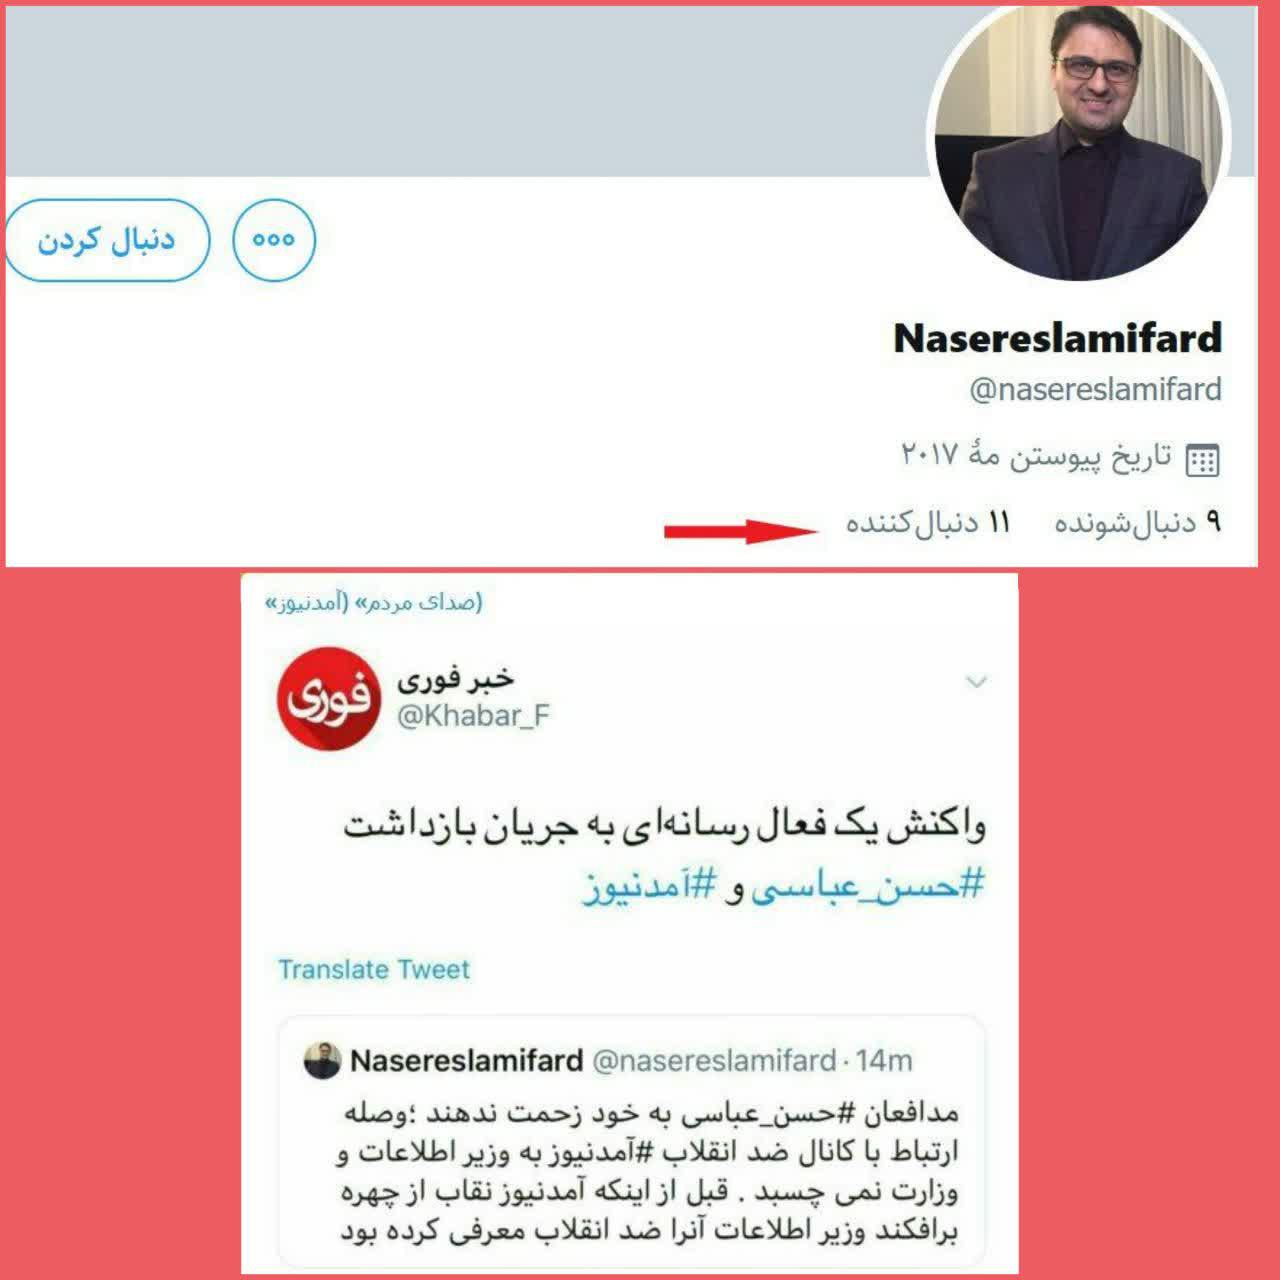 http://dl-abbasi.ir/yekta/1398/Graphic/eslamifard/eslamifard%20(1).jpg